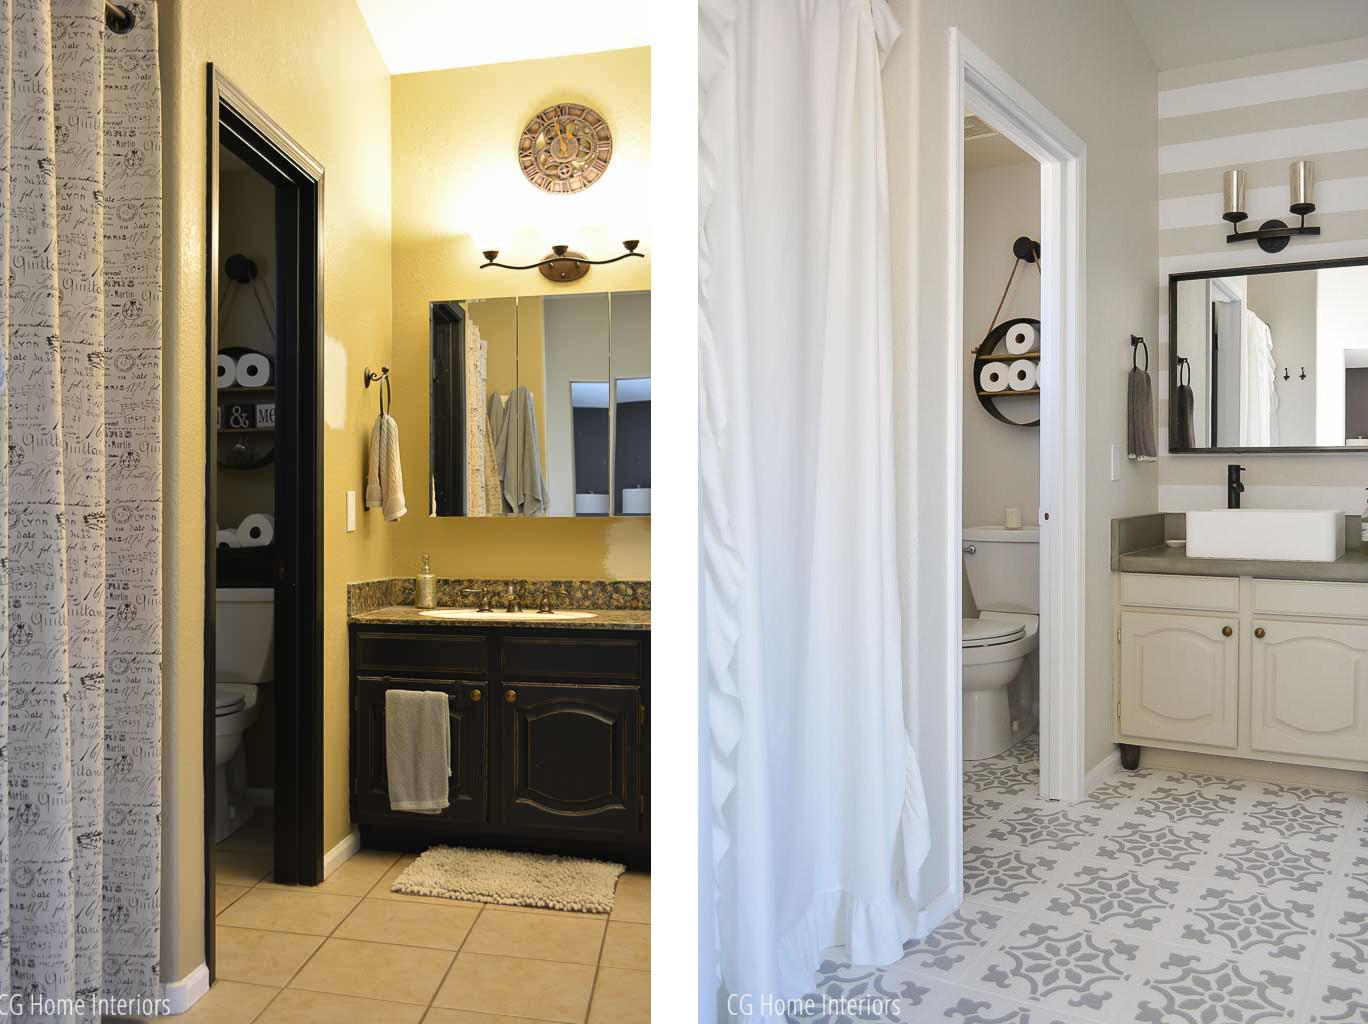 Builder Grade Bathroom Overhaul Before and After